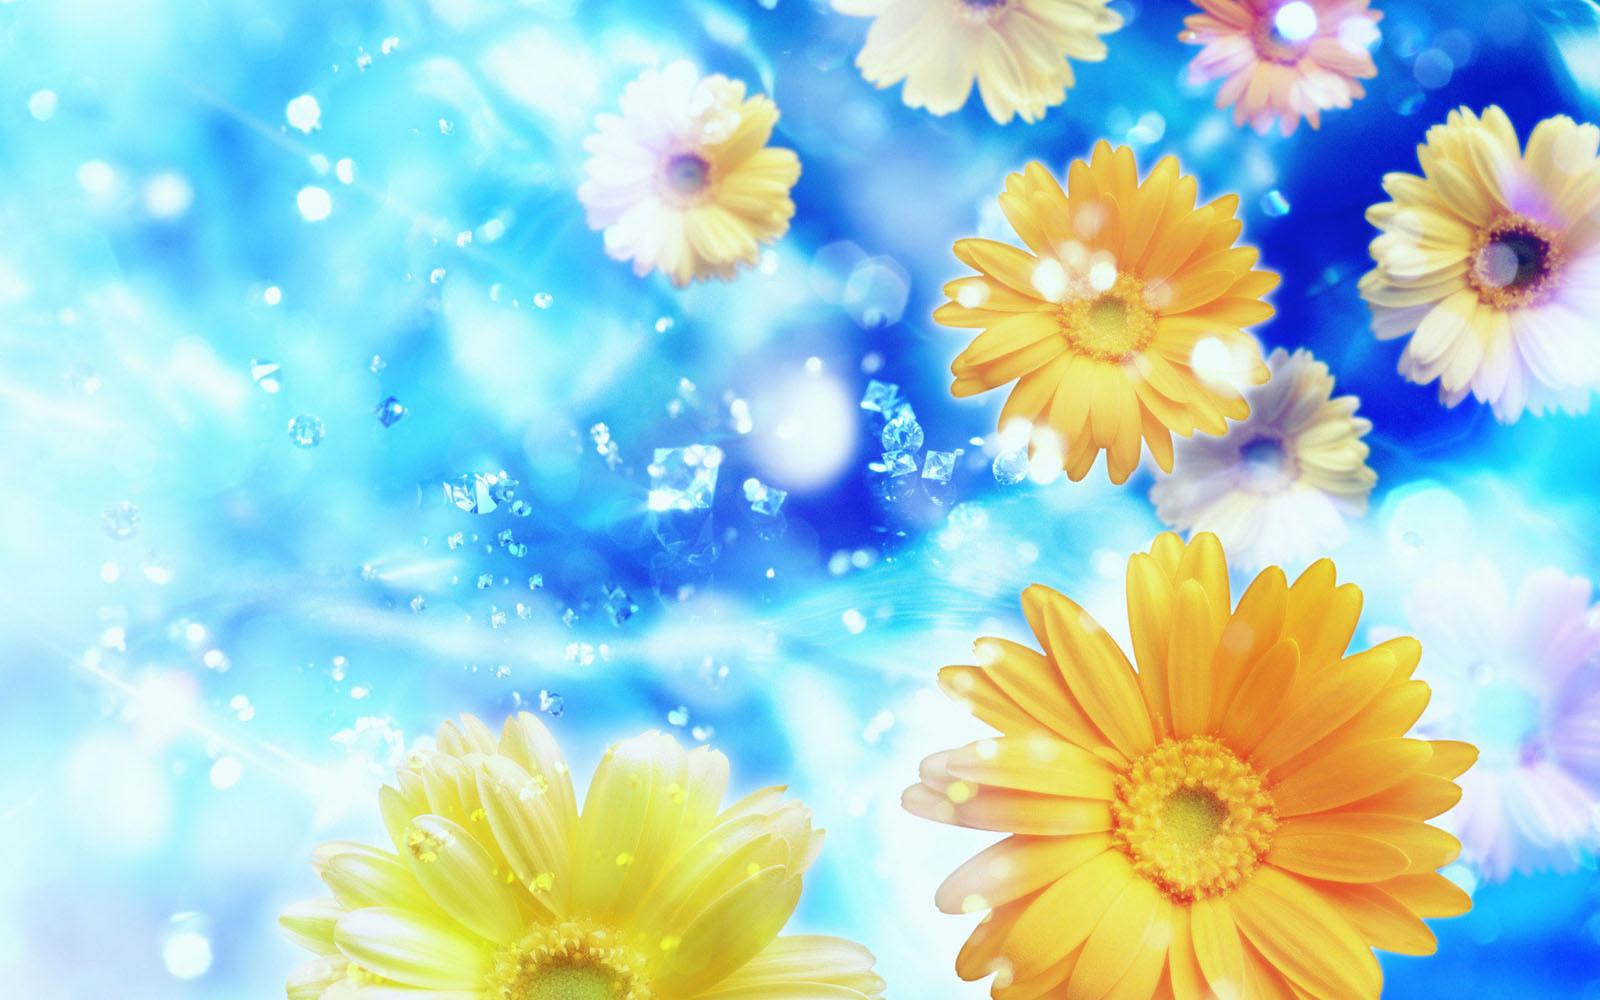 wallpapers: Windows 7 Flowers Wallpapers